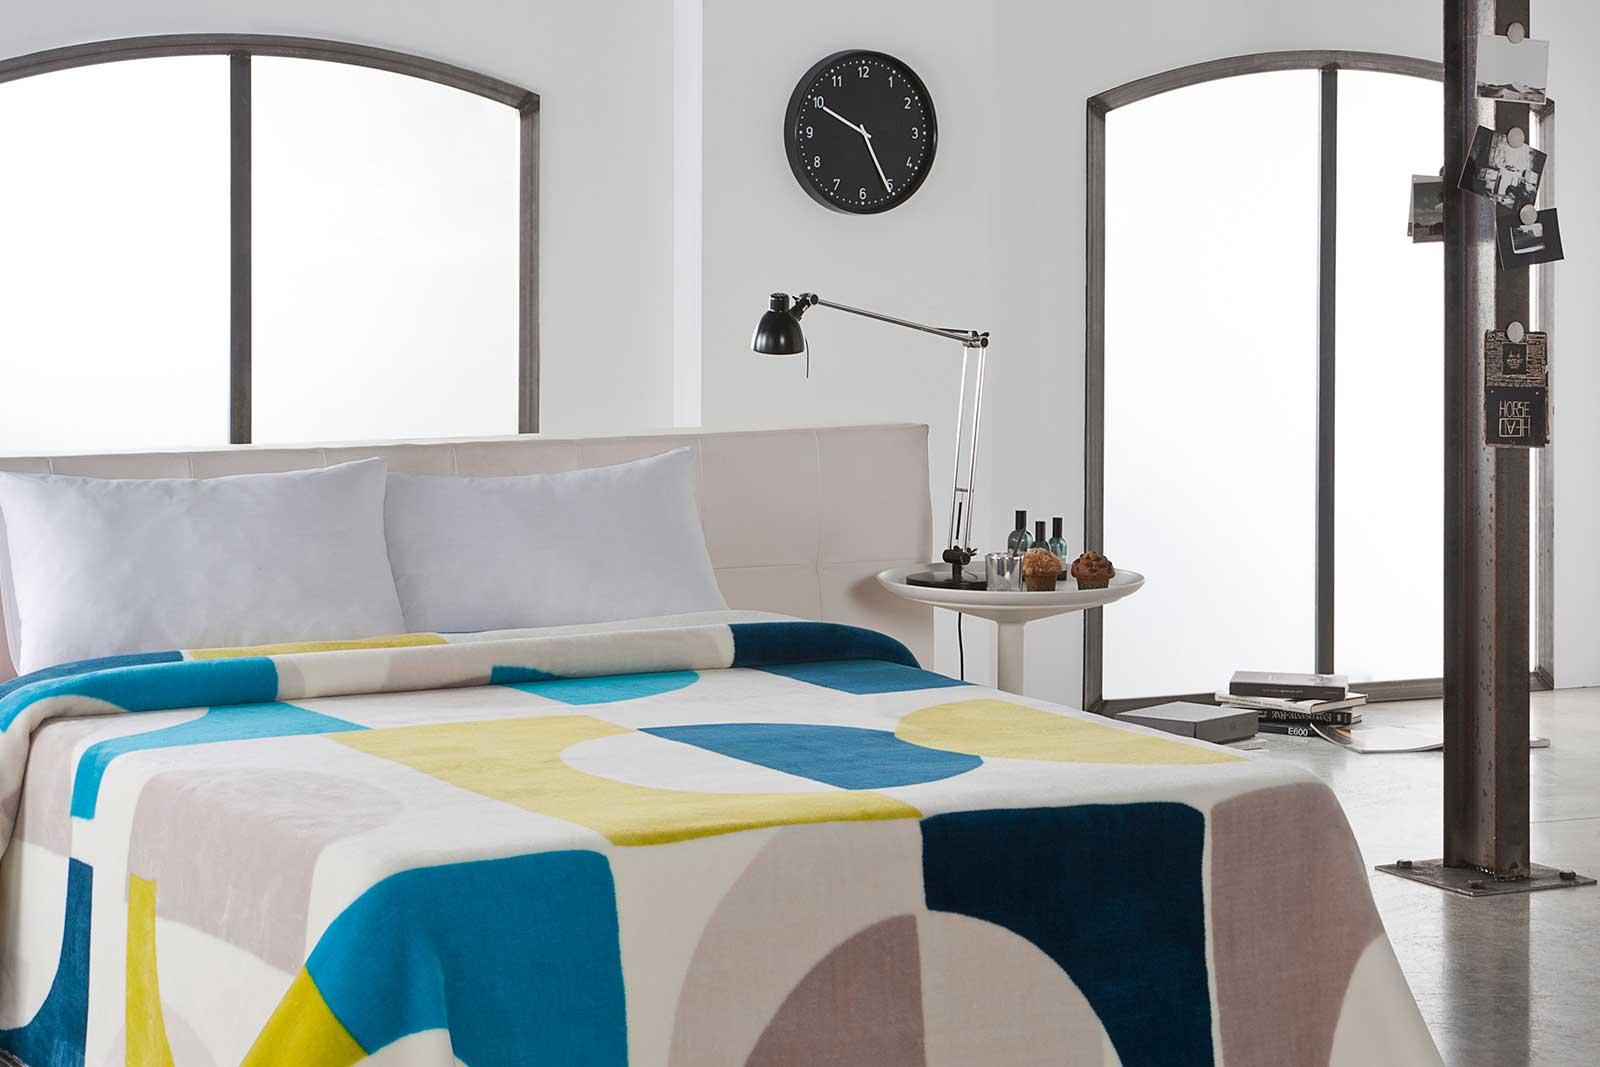 Geometrical Design Blanket